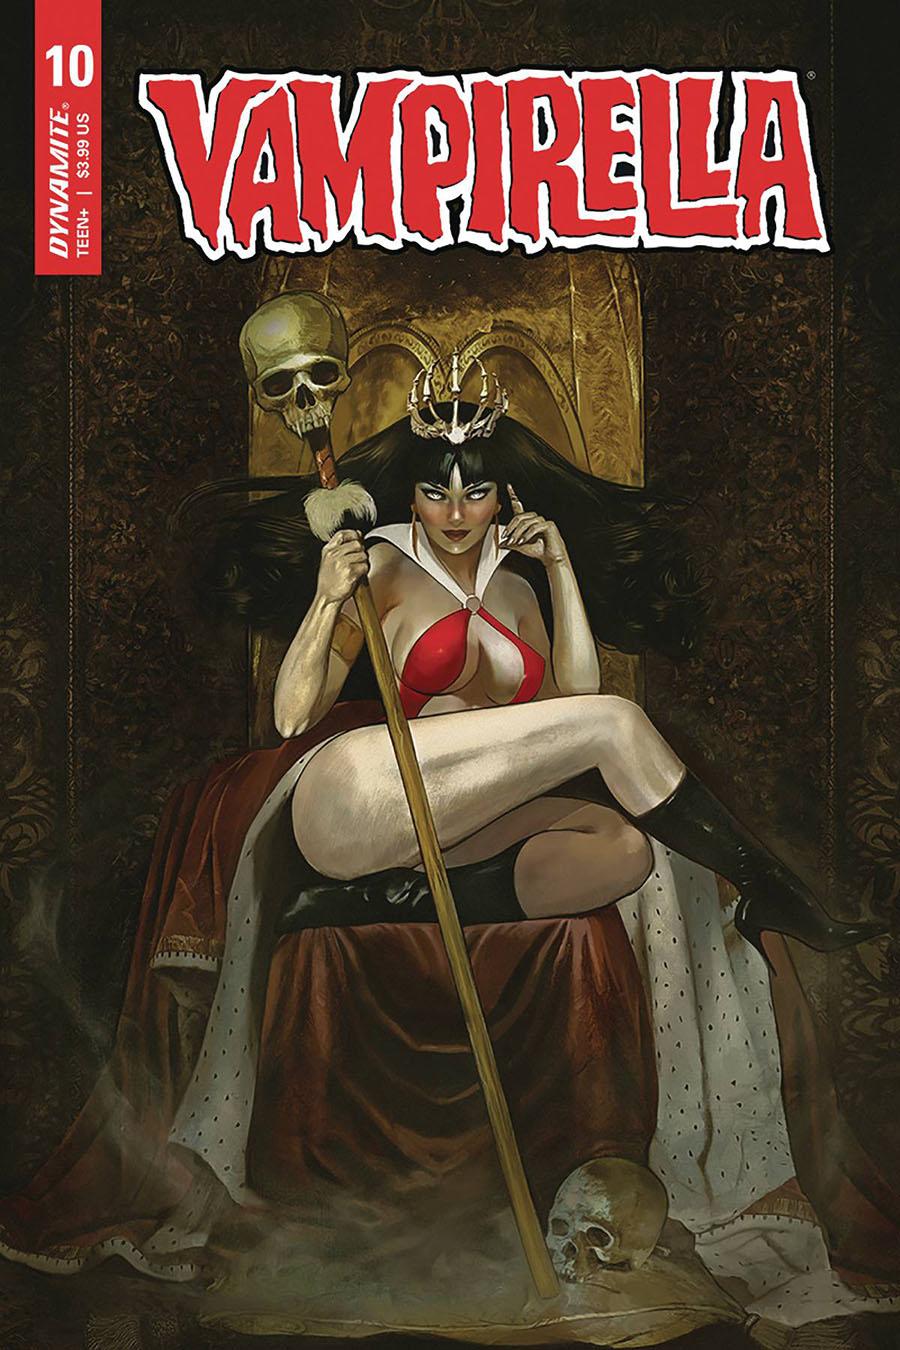 Vampirella Vol 8 #10 Cover C Variant Fay Dalton Cover